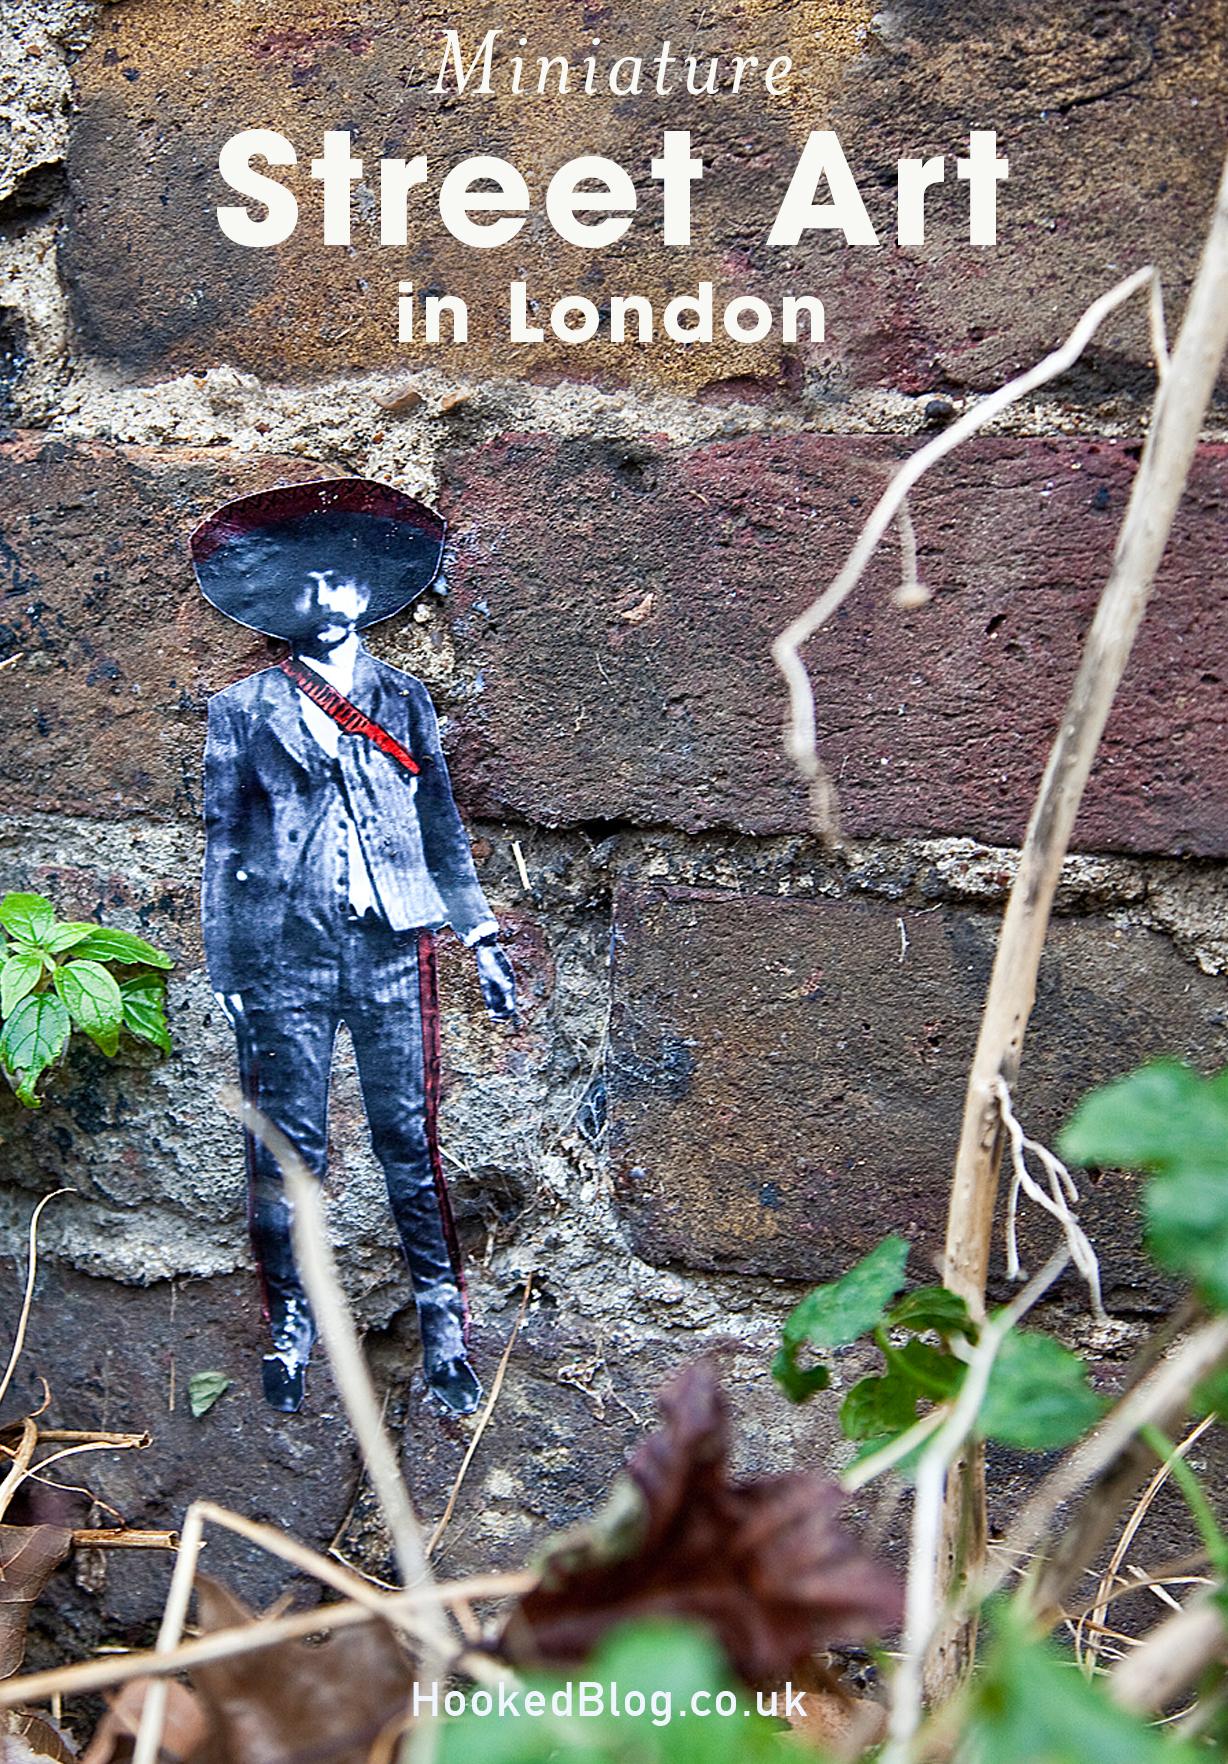 Mexican Street Art in London by artist Pablo Degado